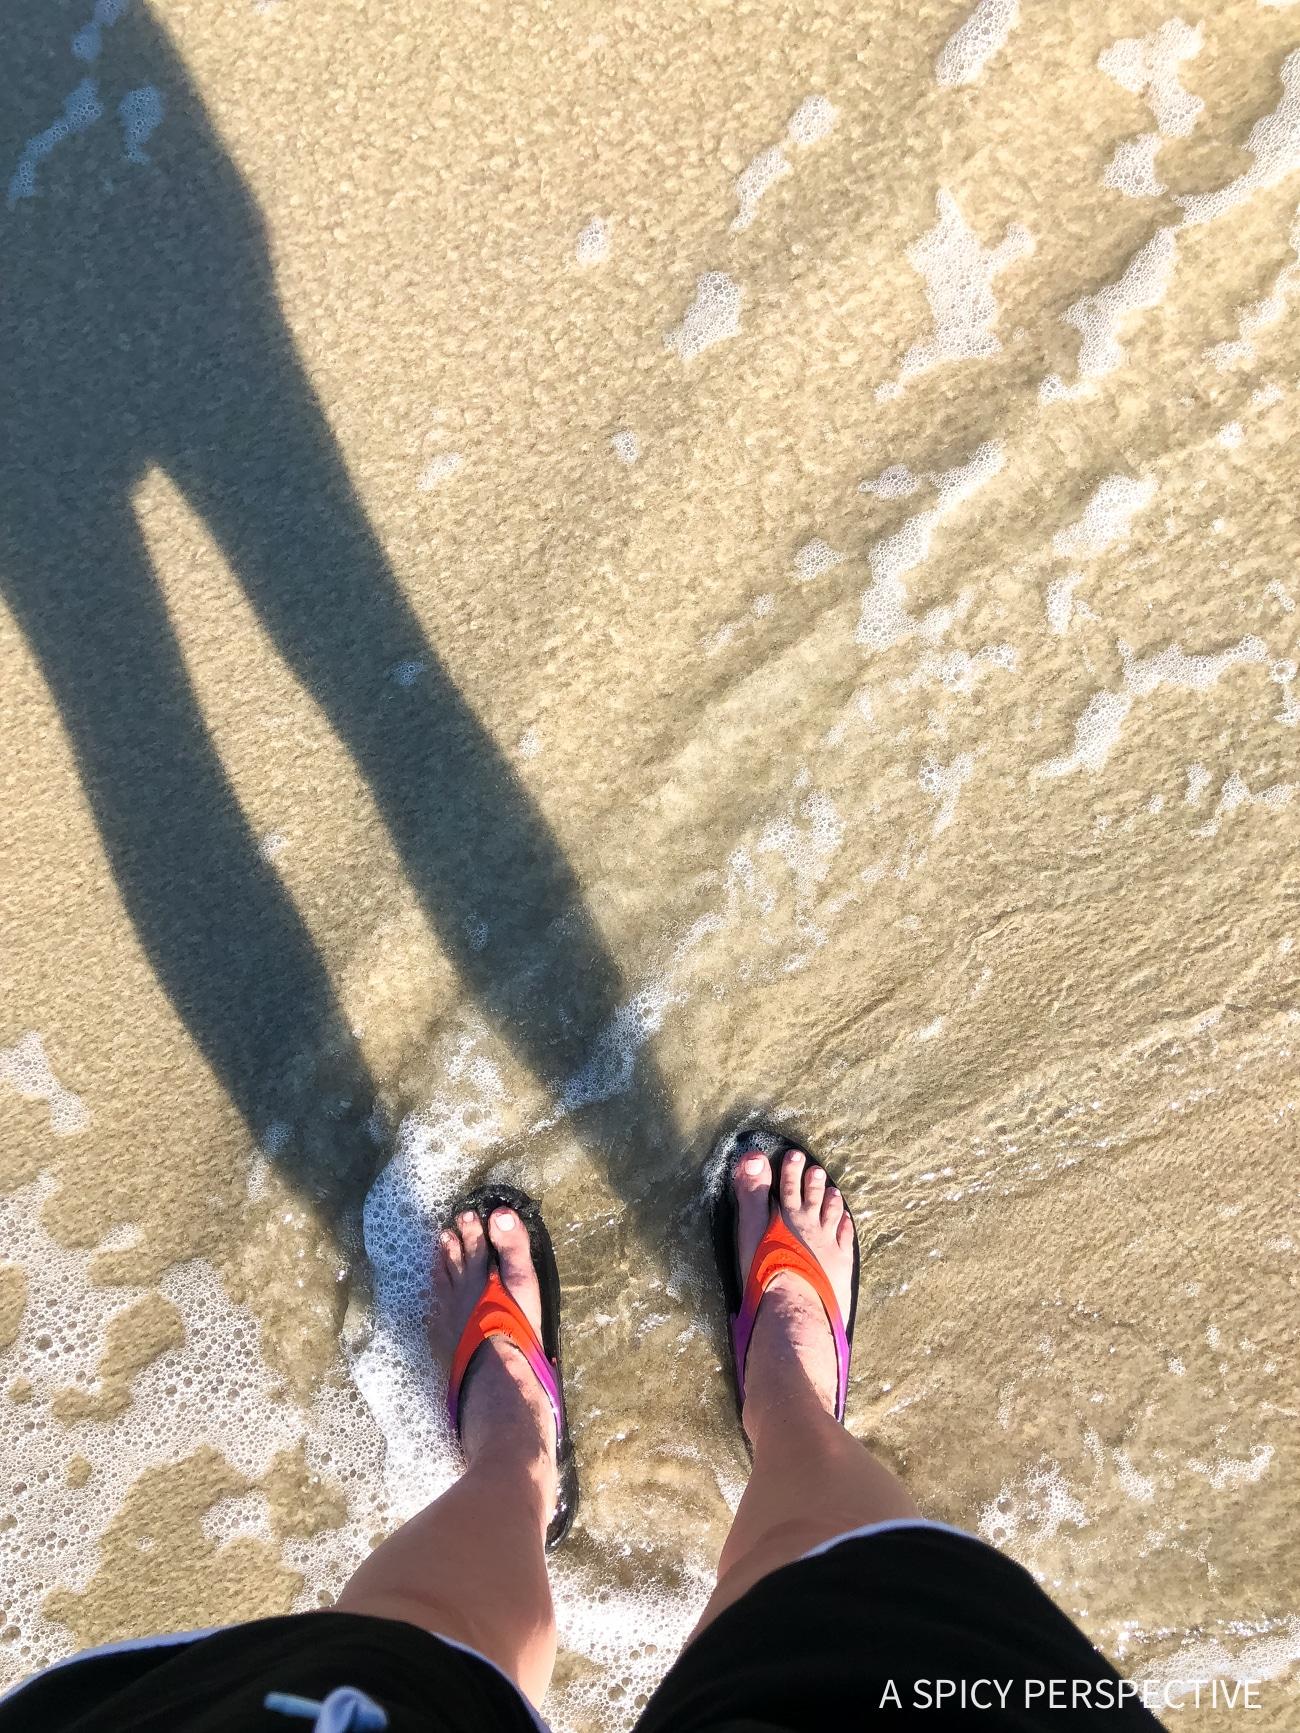 Crystal Coast Outer Banks NC Vacation Travel Tips